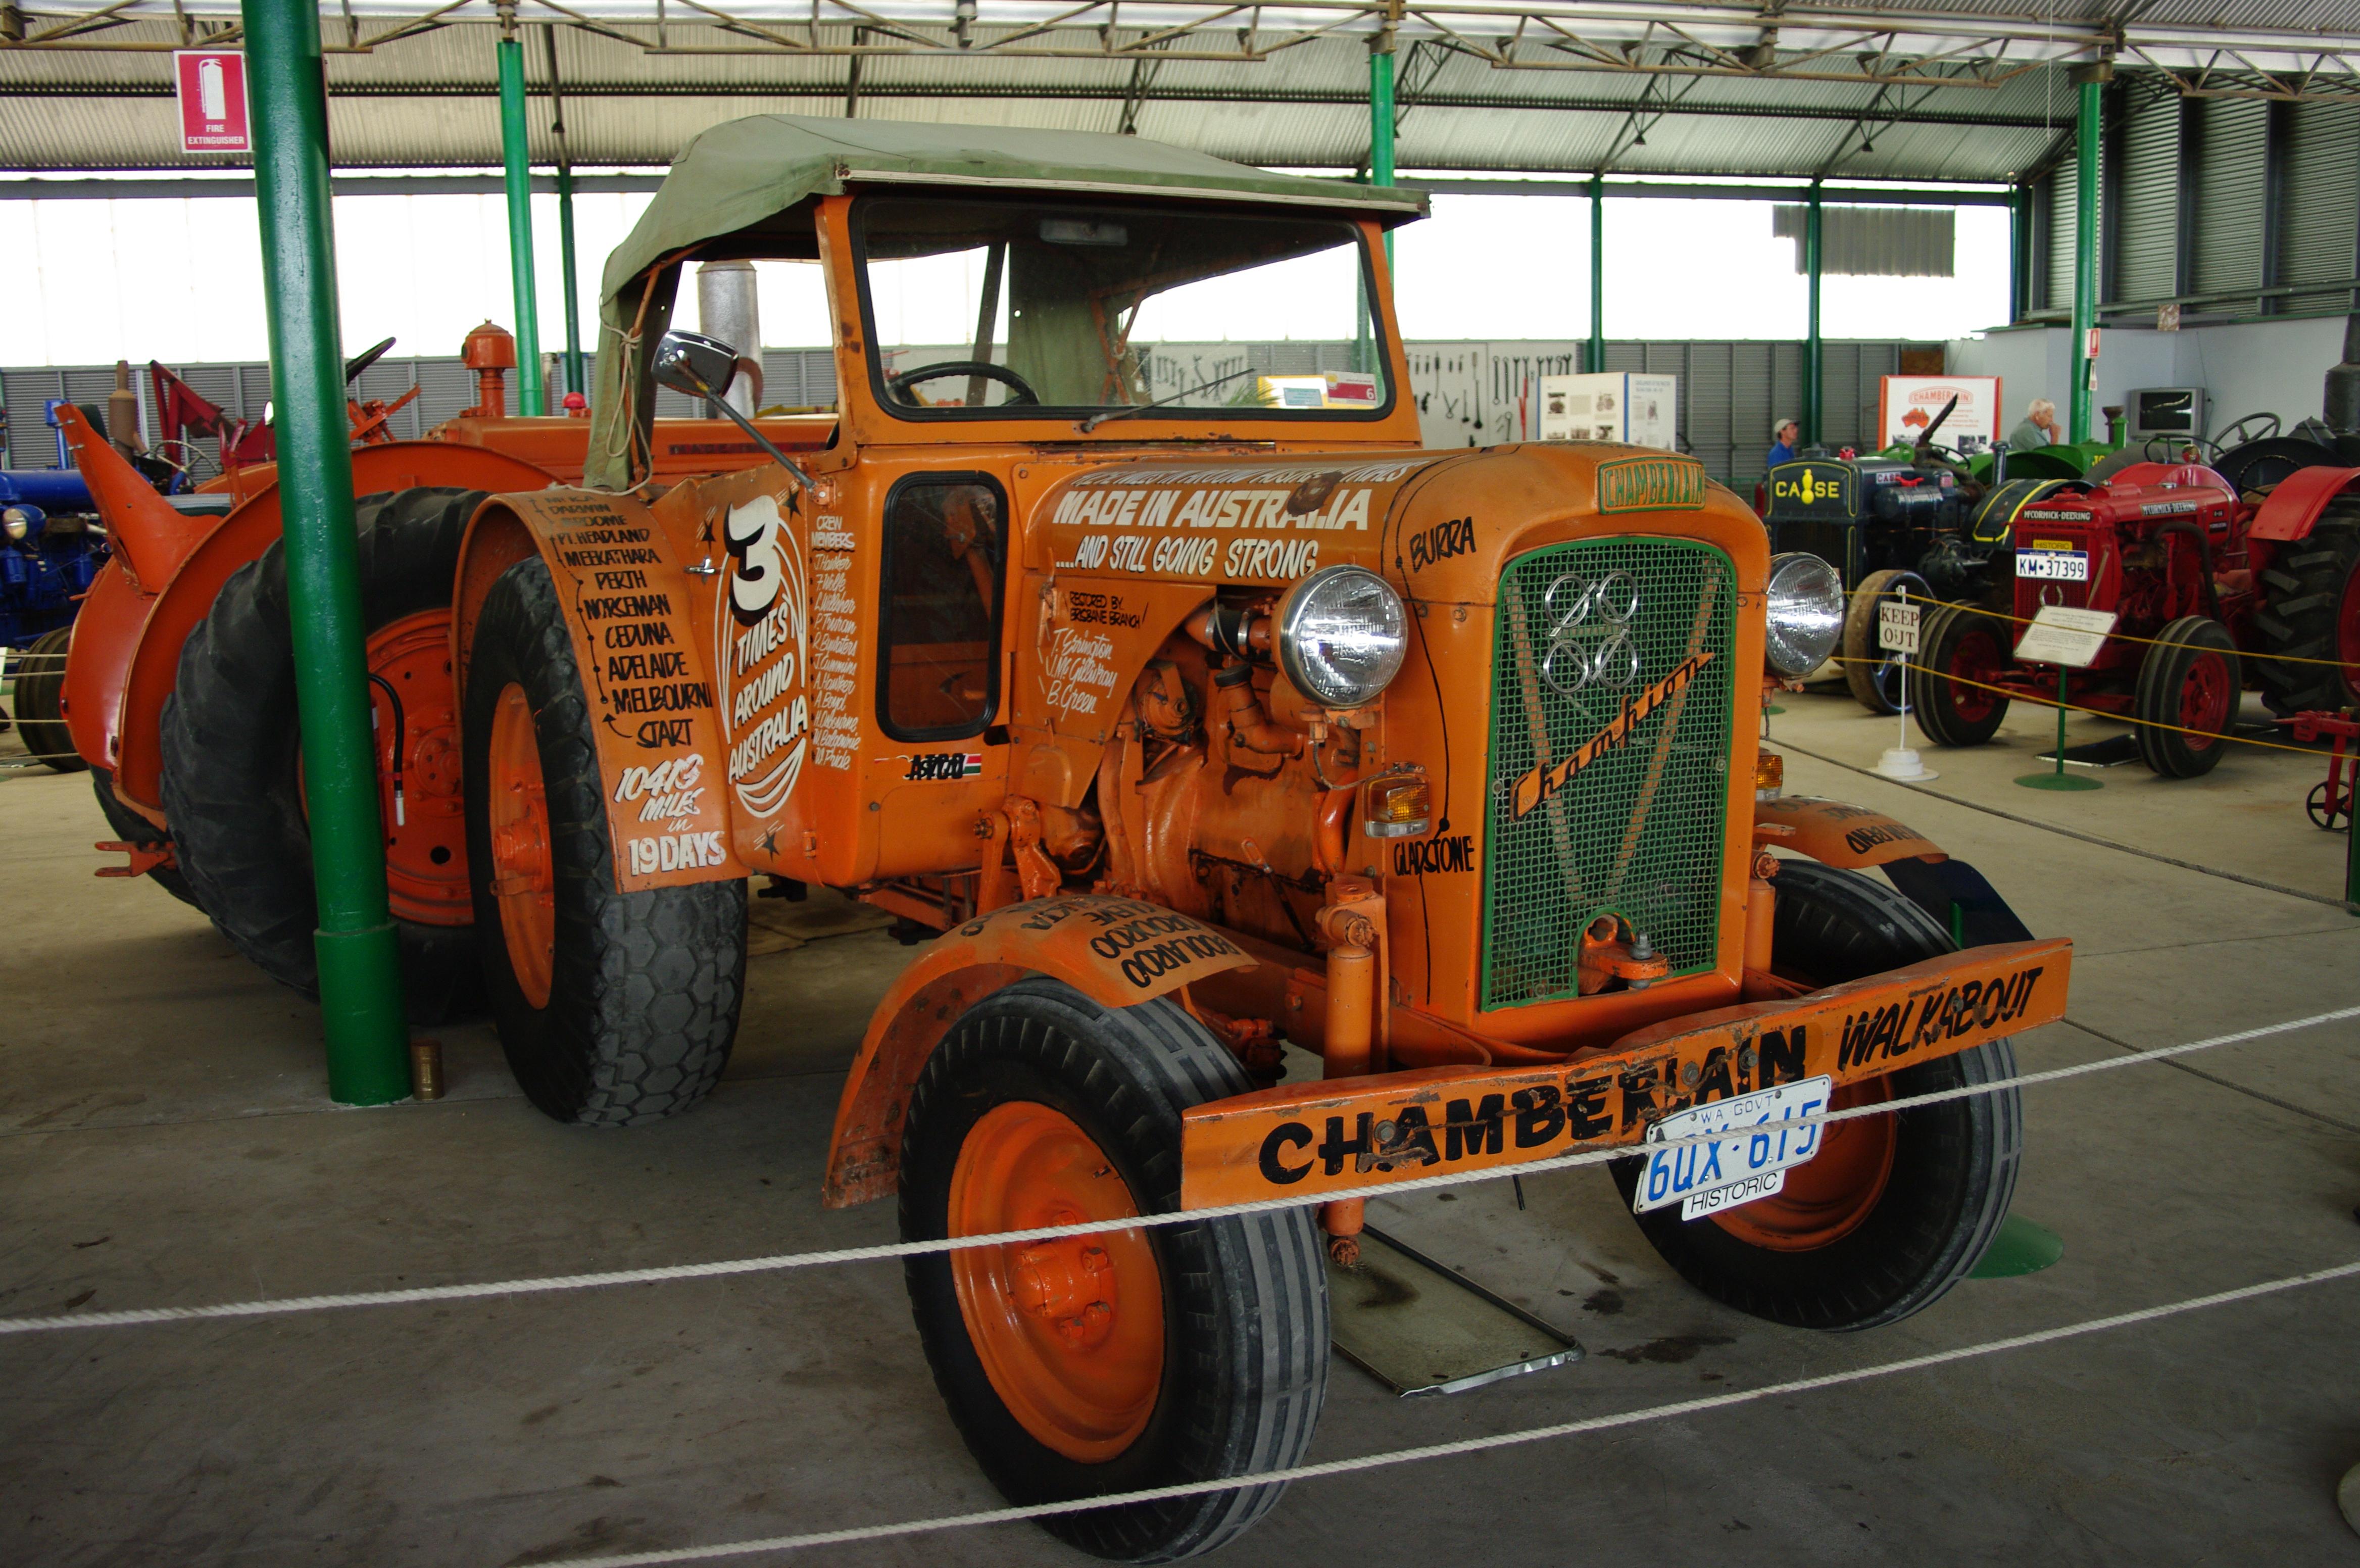 13a506f87 Chamberlain Tractors - Wikipedia